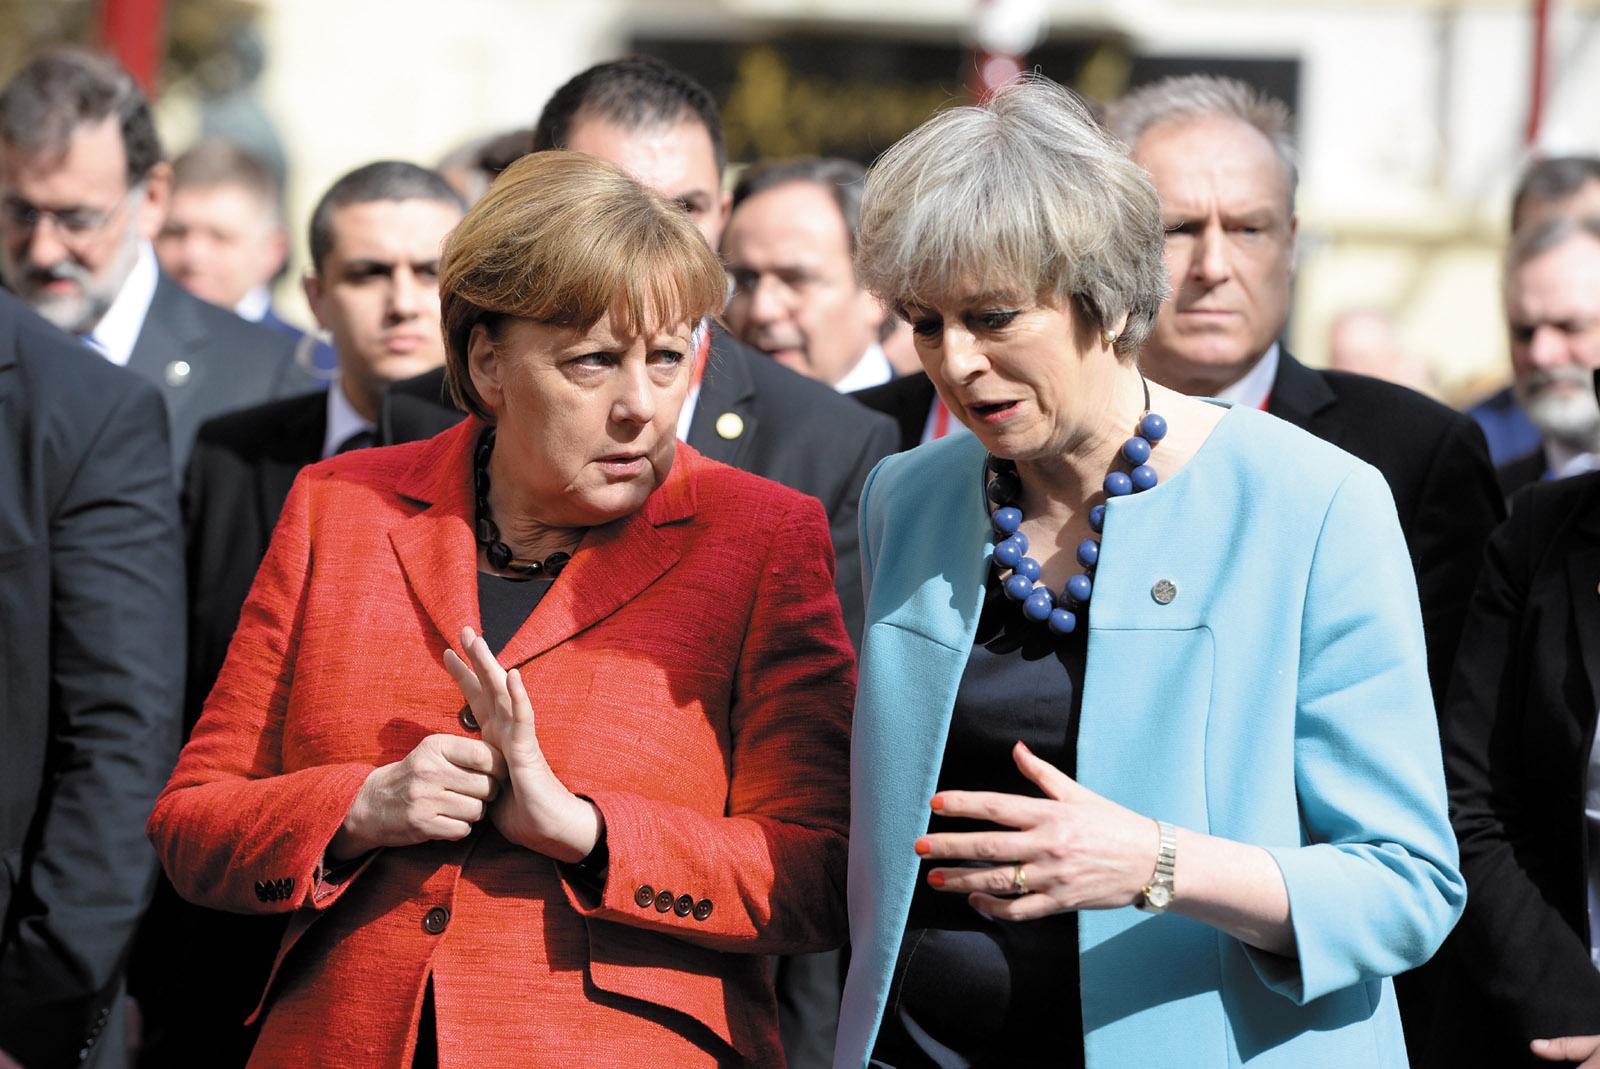 German Chancellor Angela Merkel and British Prime Minister Theresa May at a European Union summit, Valletta, Malta, February 2017